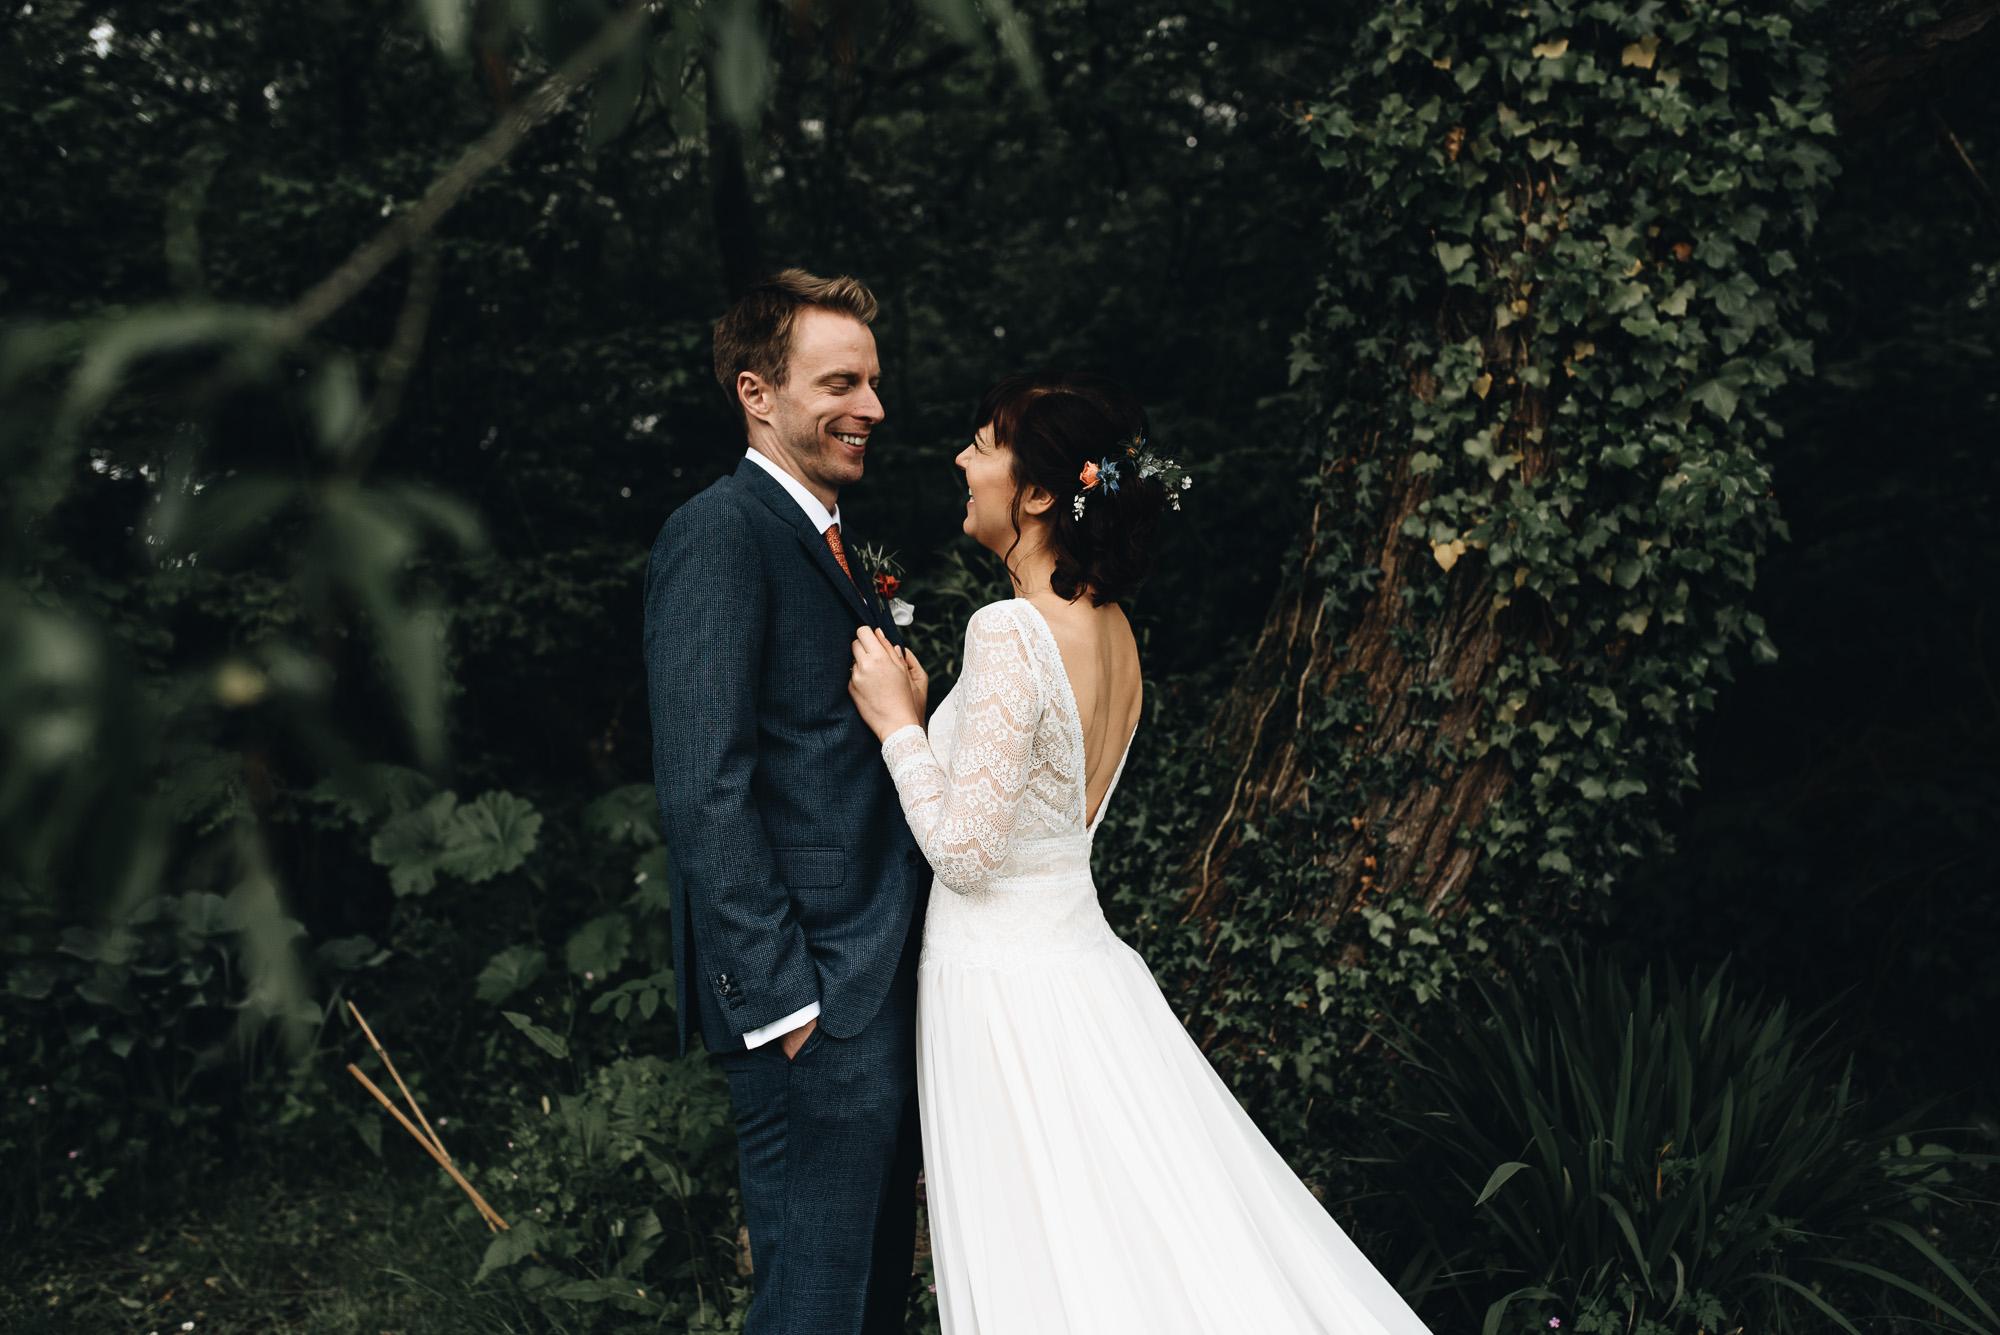 Our Beautiful Adventure | Wedding Photography | South Wales | Maesbrook Barn Wedding